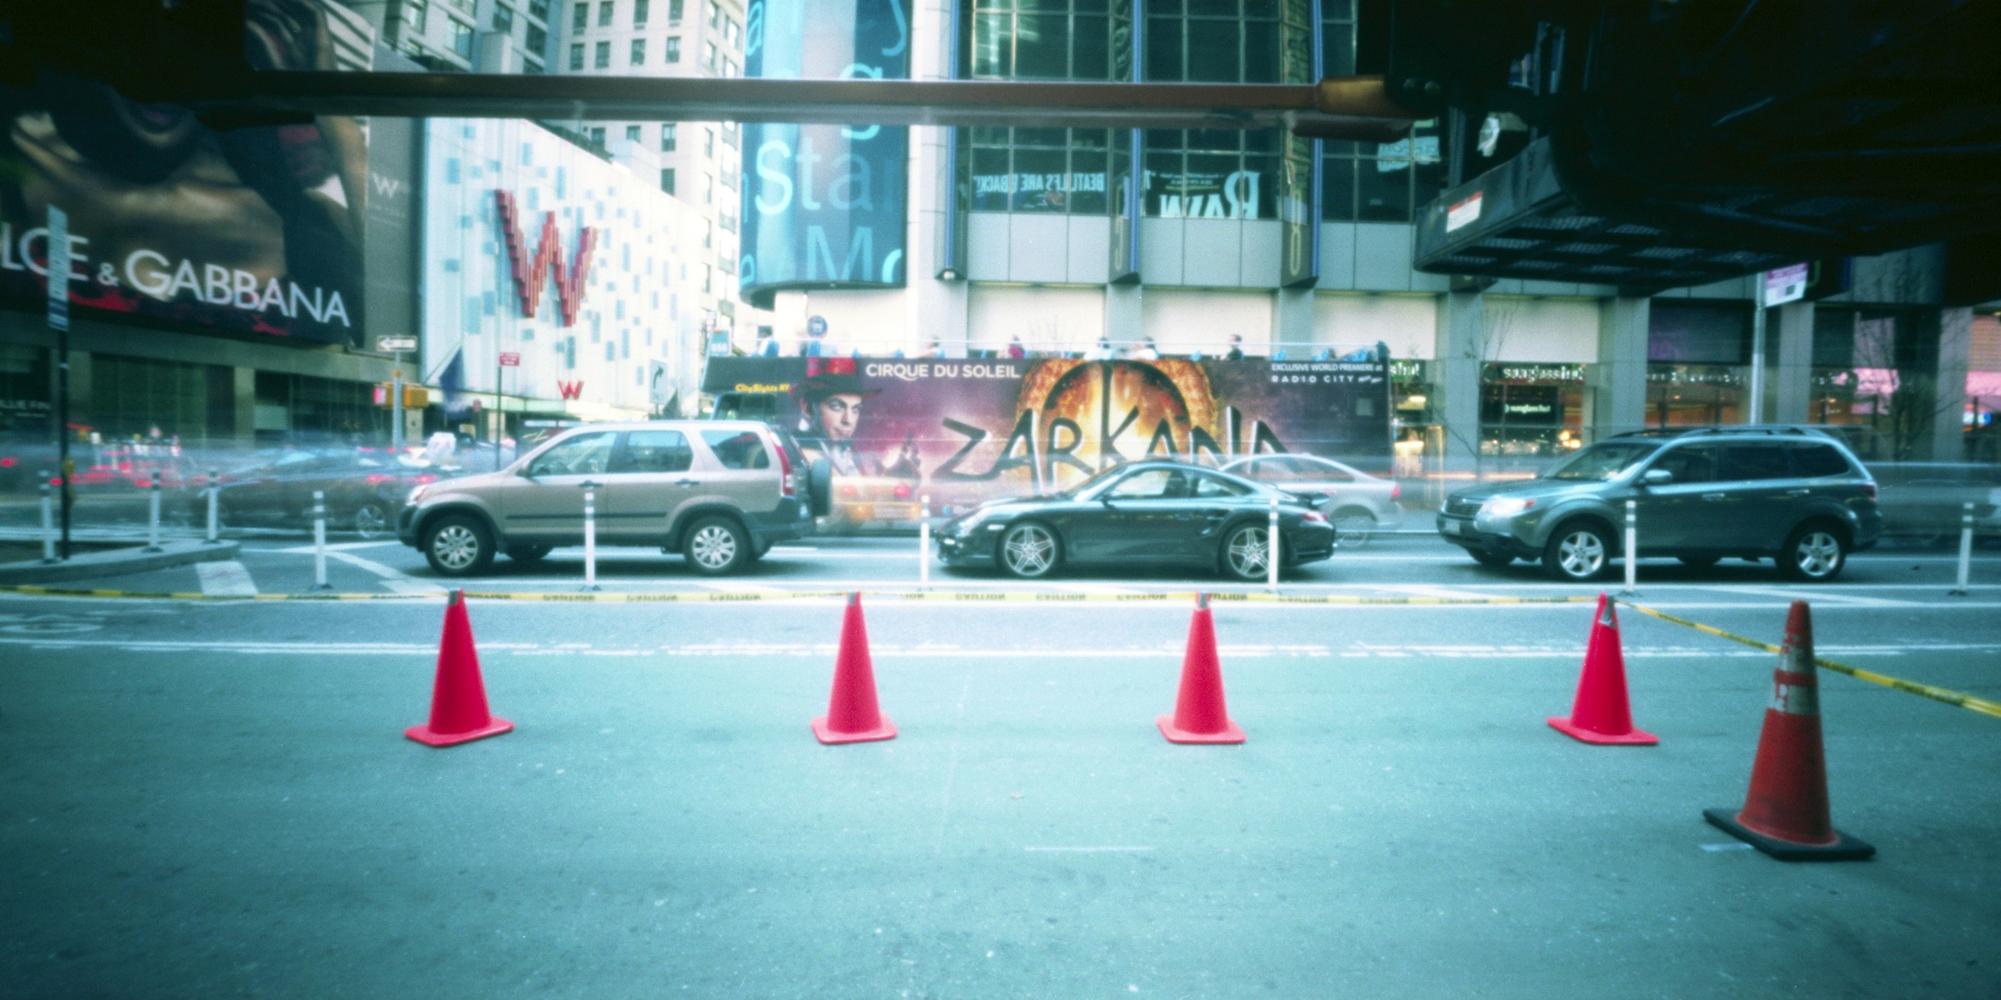 Broadway, New York, USA.